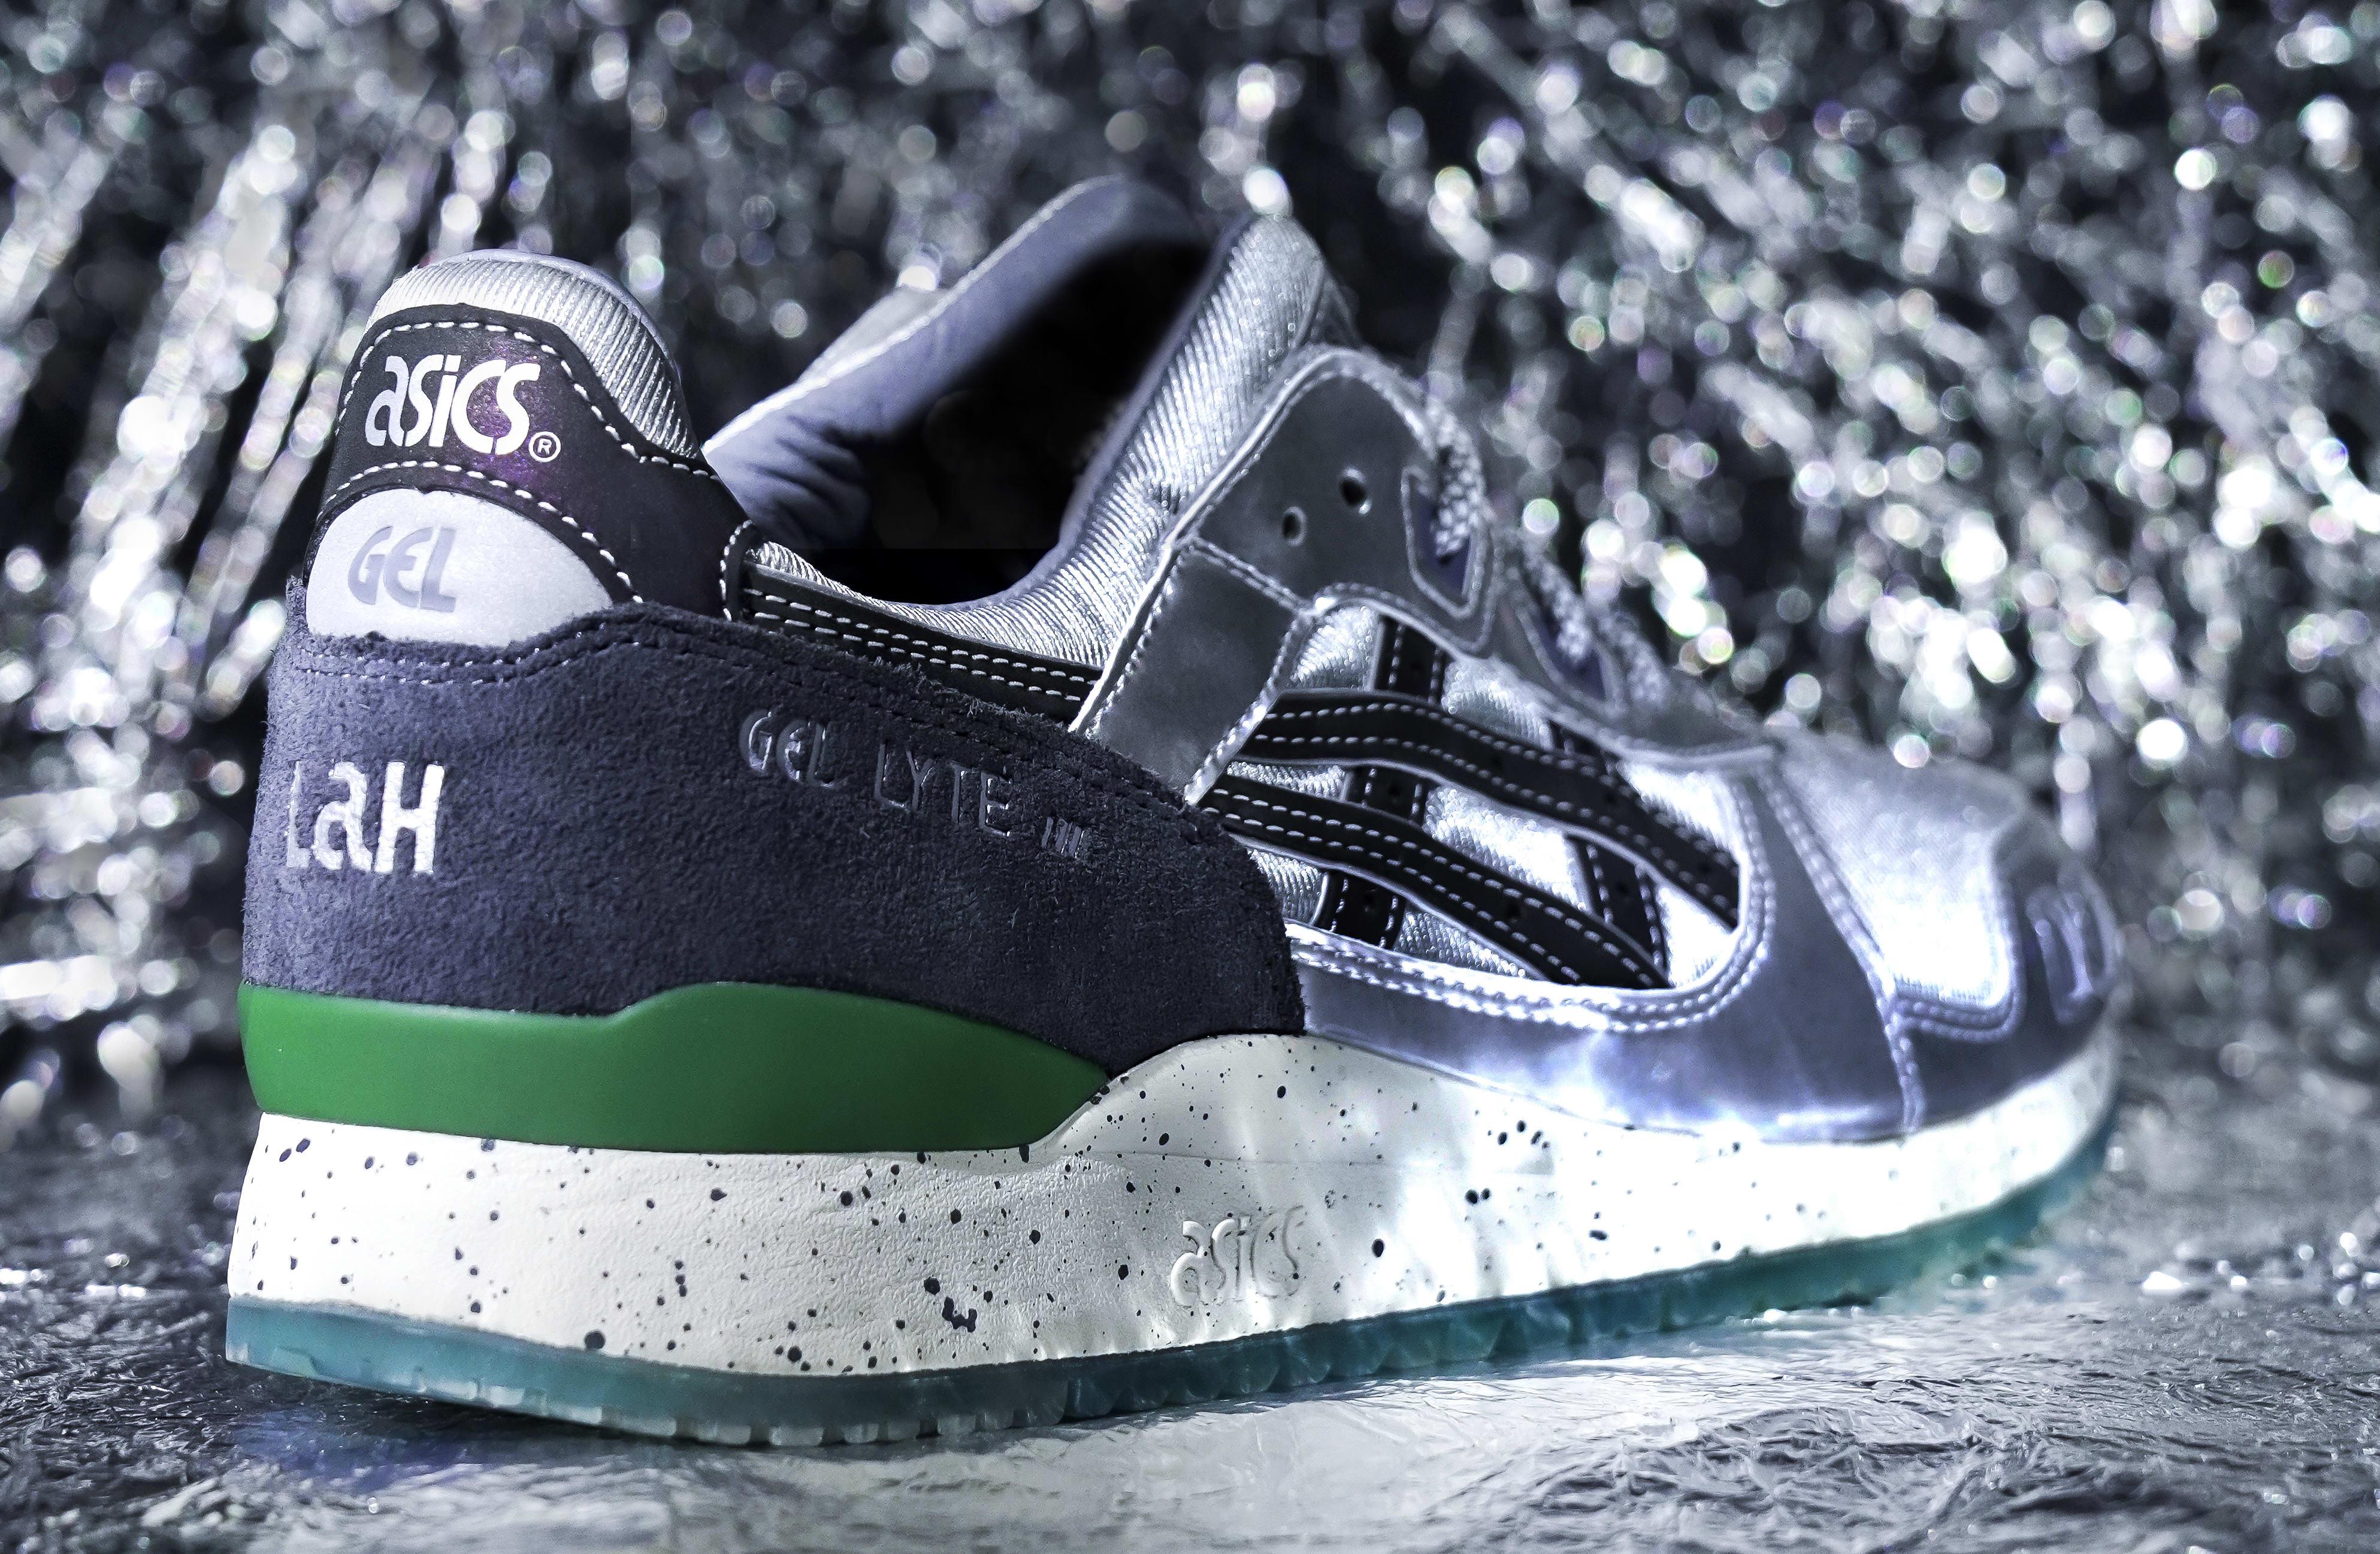 HUNDRED% x SneakerLAH x Asics Gel-Lyte 3 'Kuala Lumpur Twin Towers' Heel